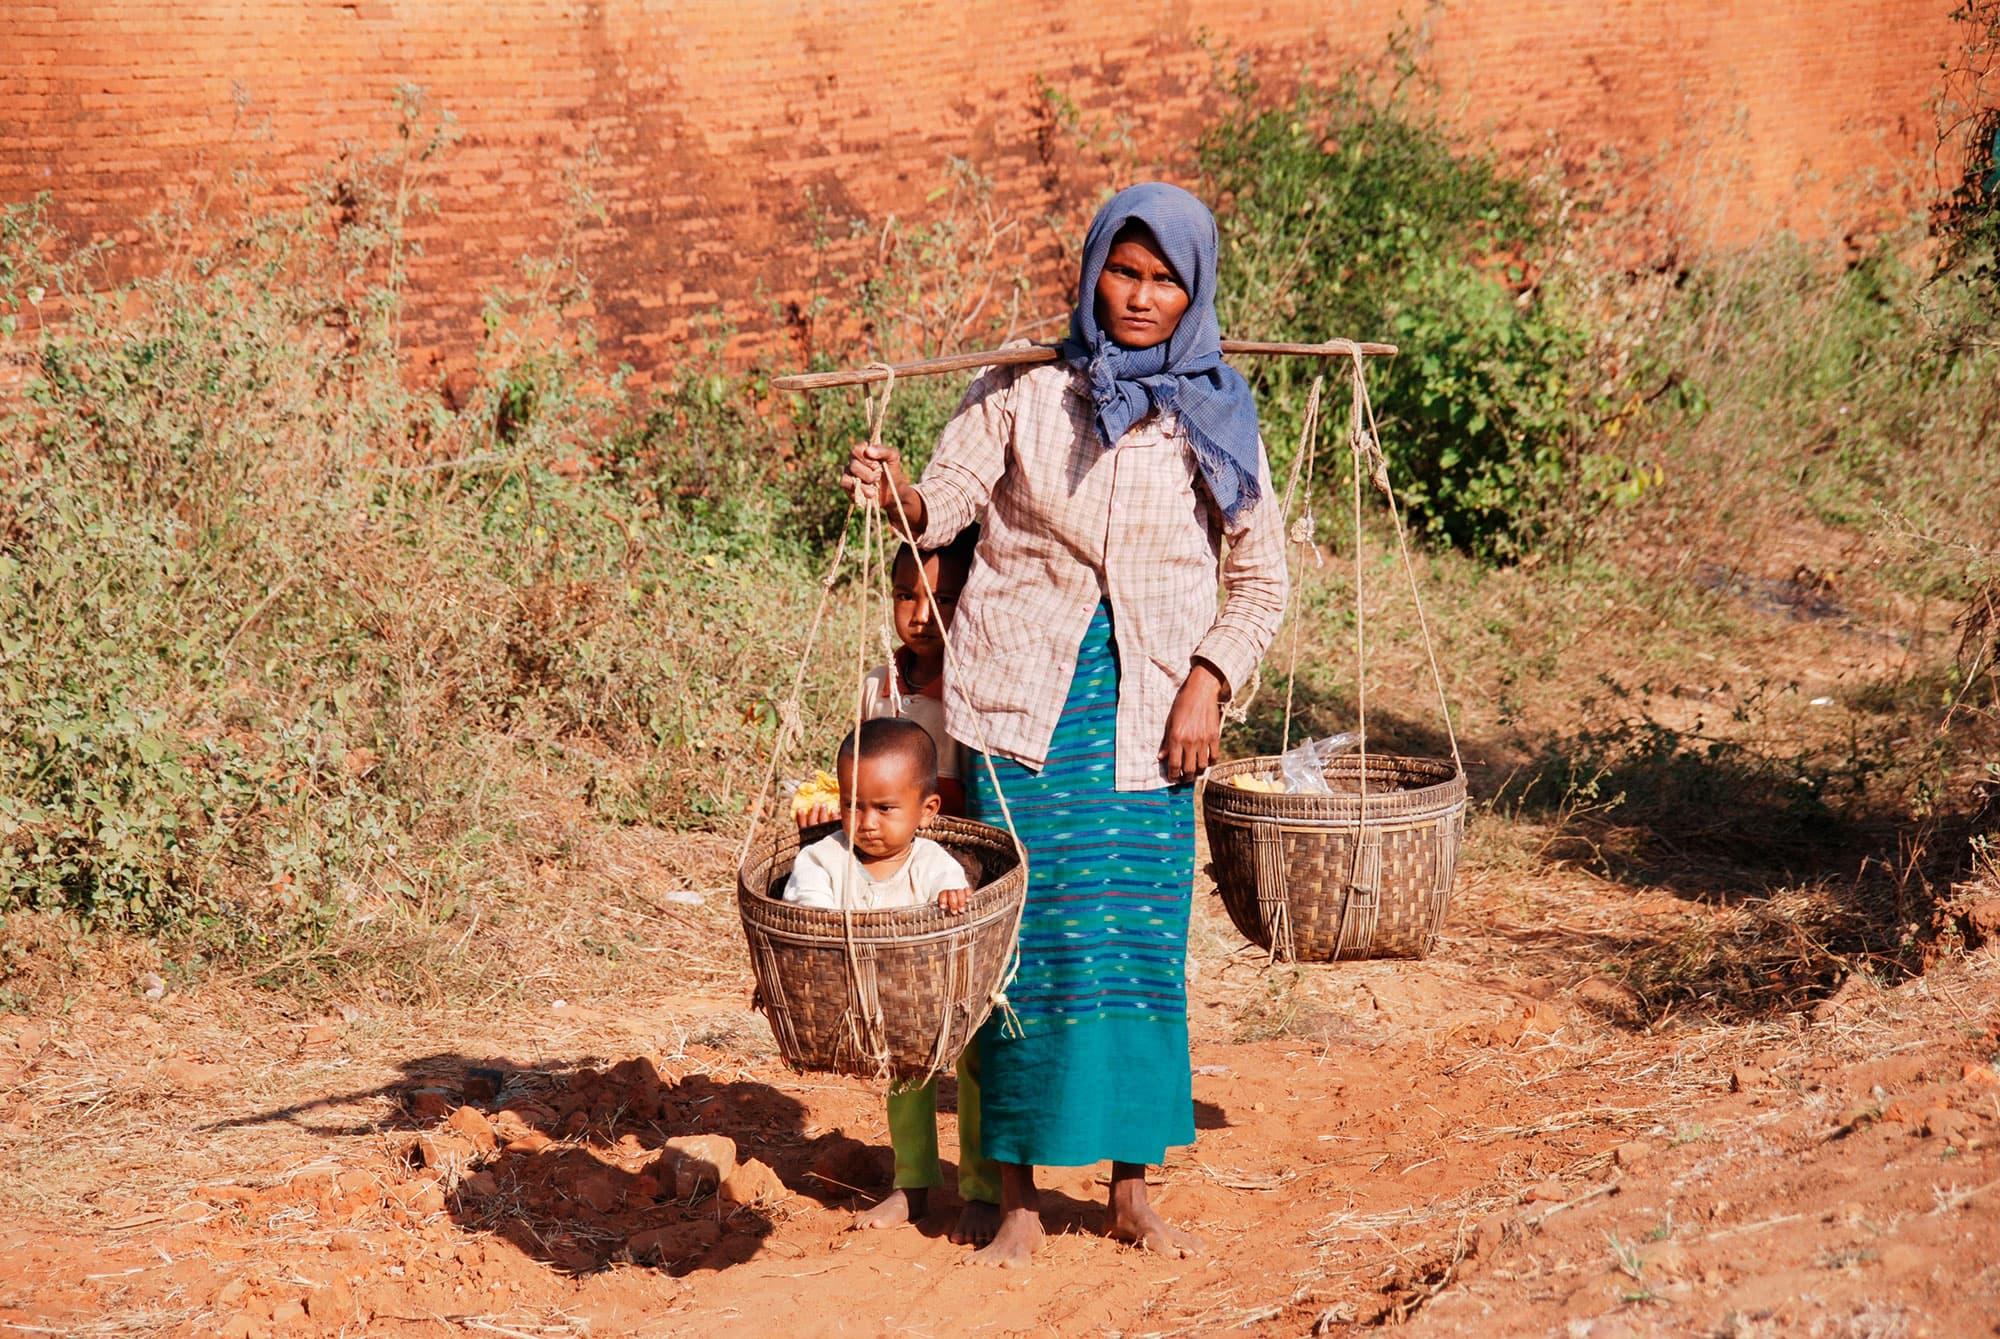 Myanmar espléndido, viaje de lujo - Myanmar- imagen #9